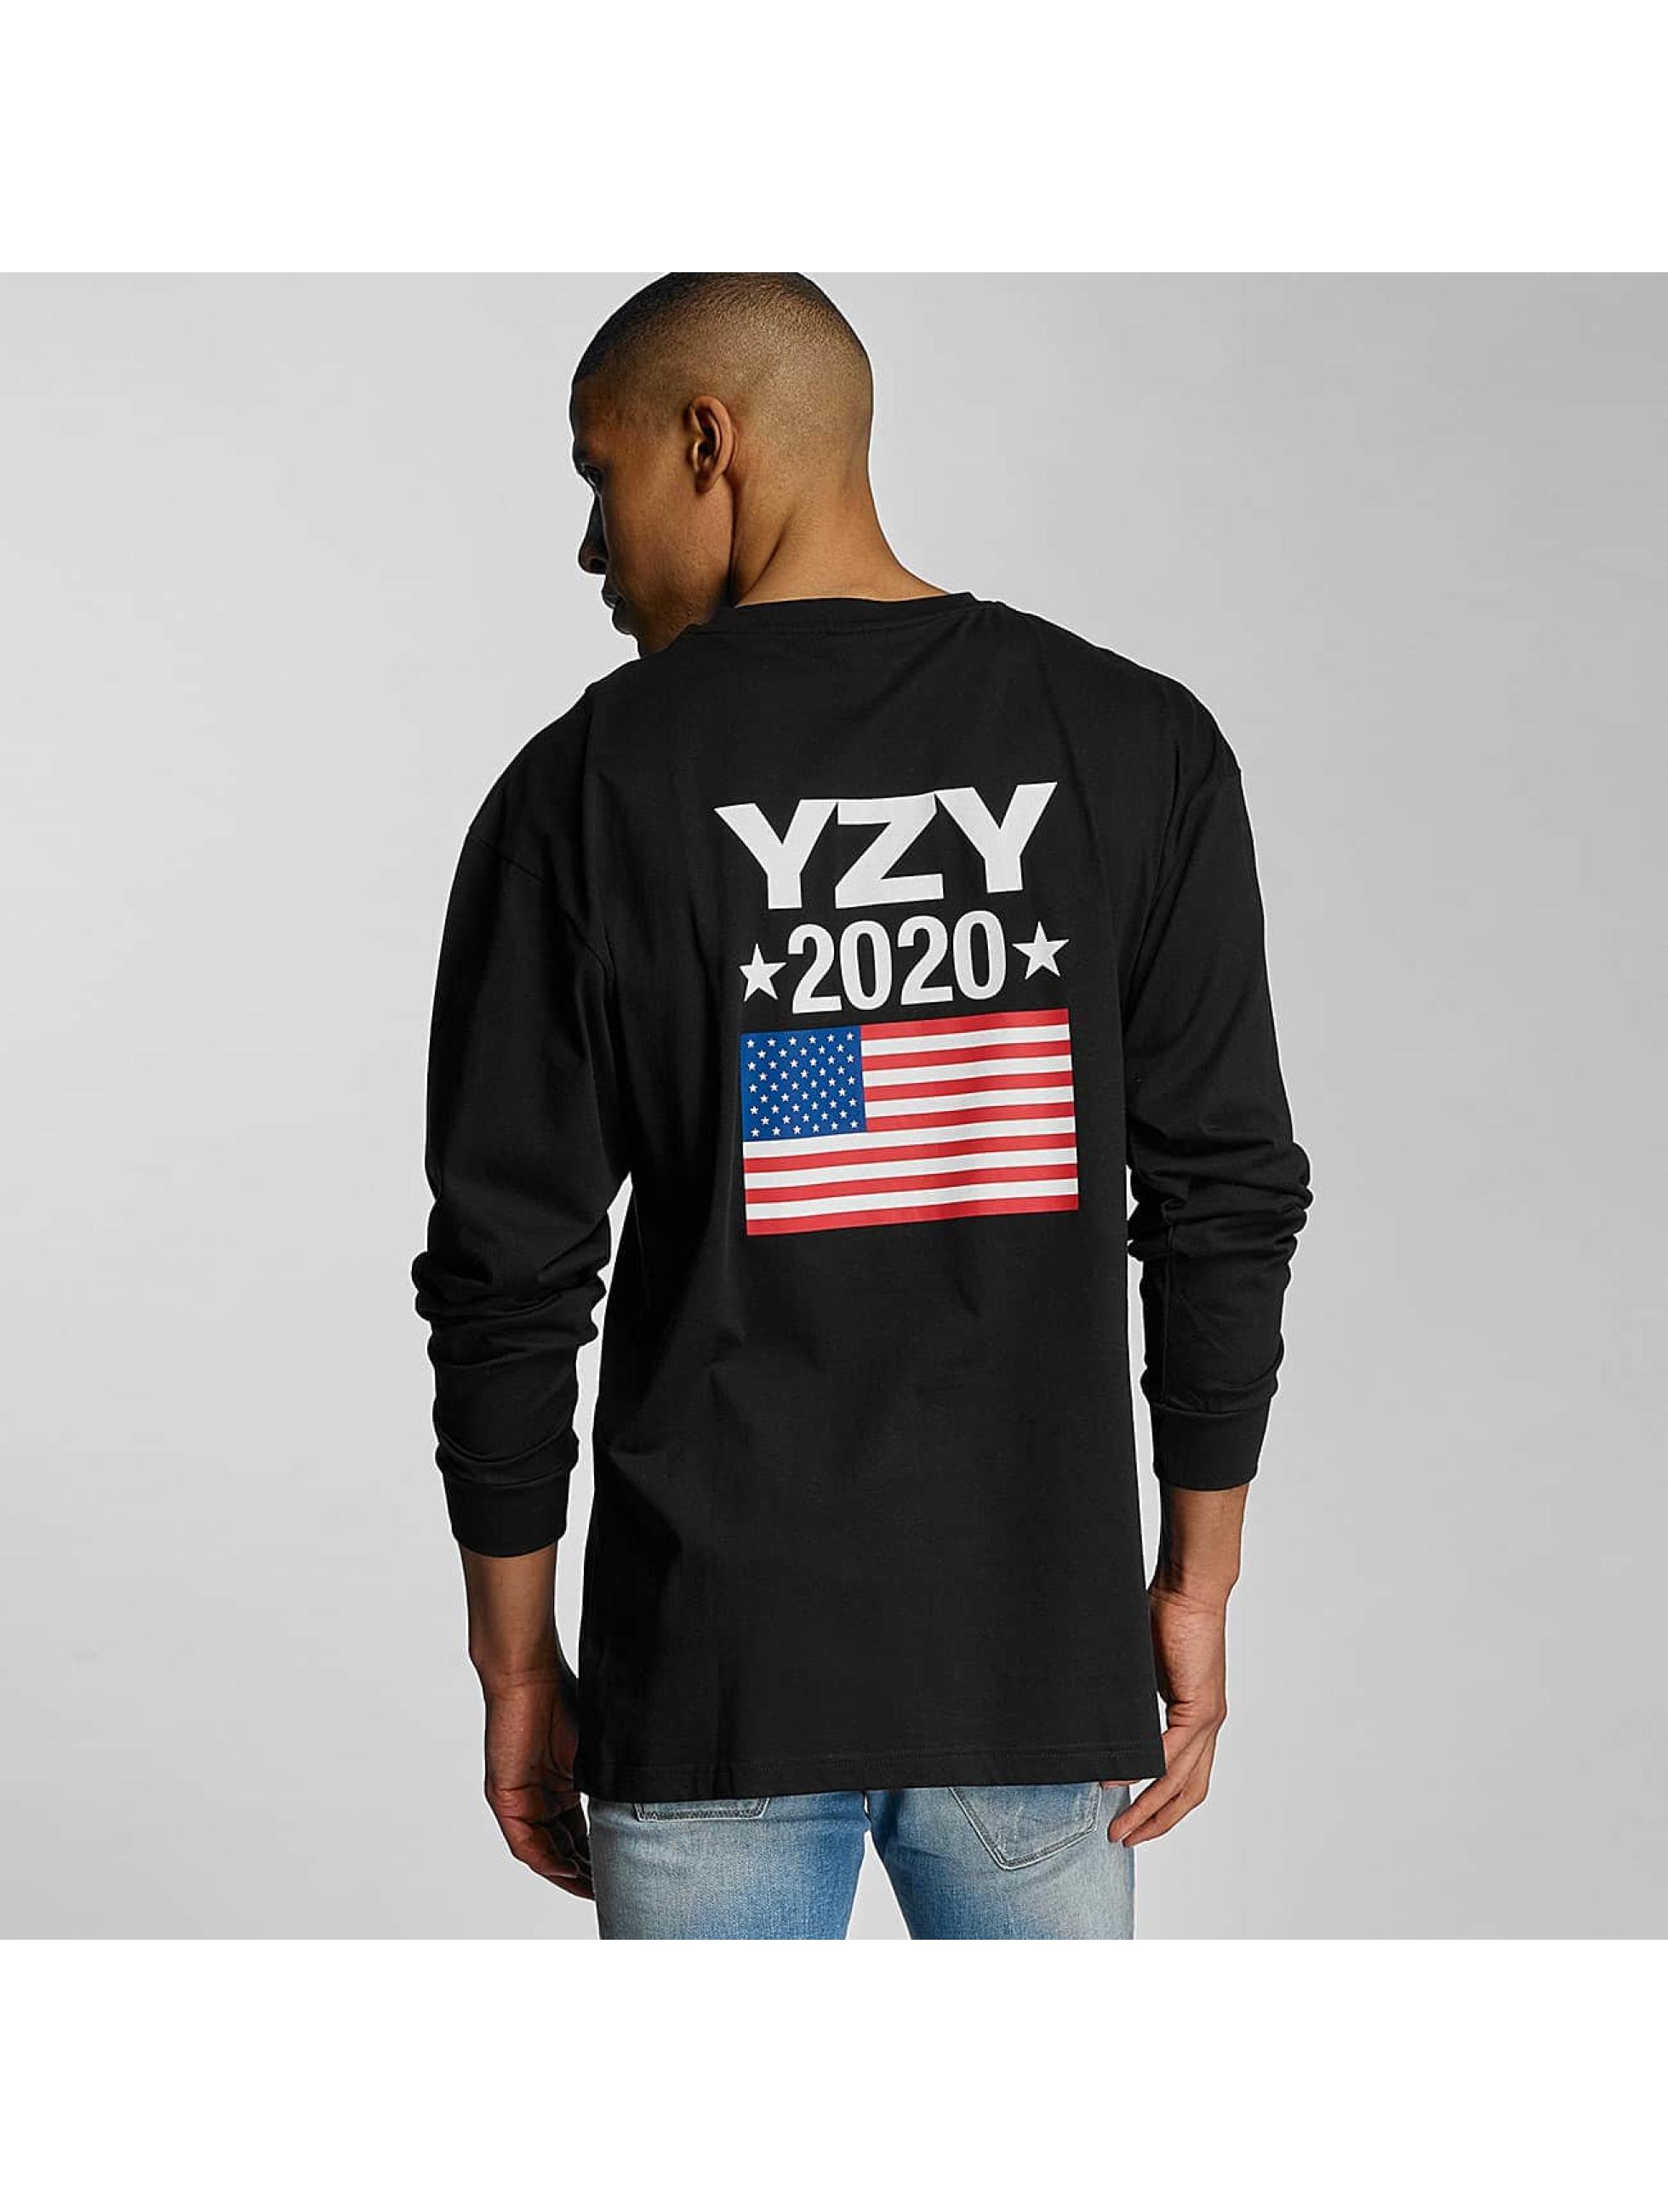 Kreem Longsleeve YZY 2020 schwarz